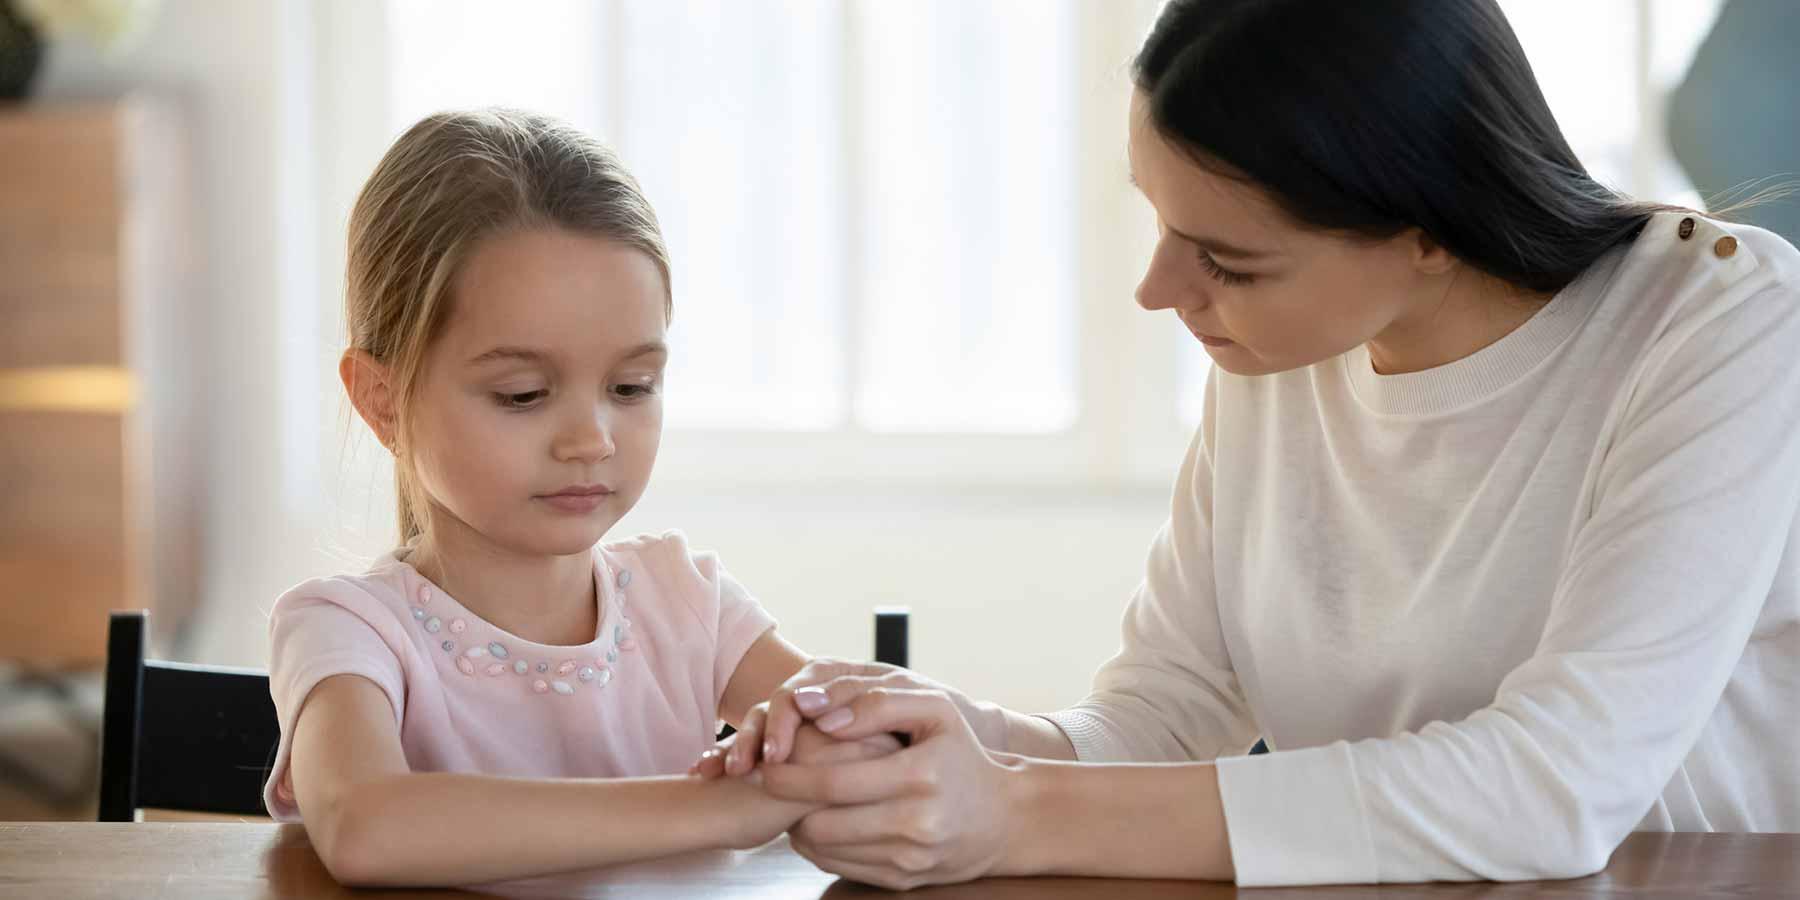 covid 19 symptoms in children